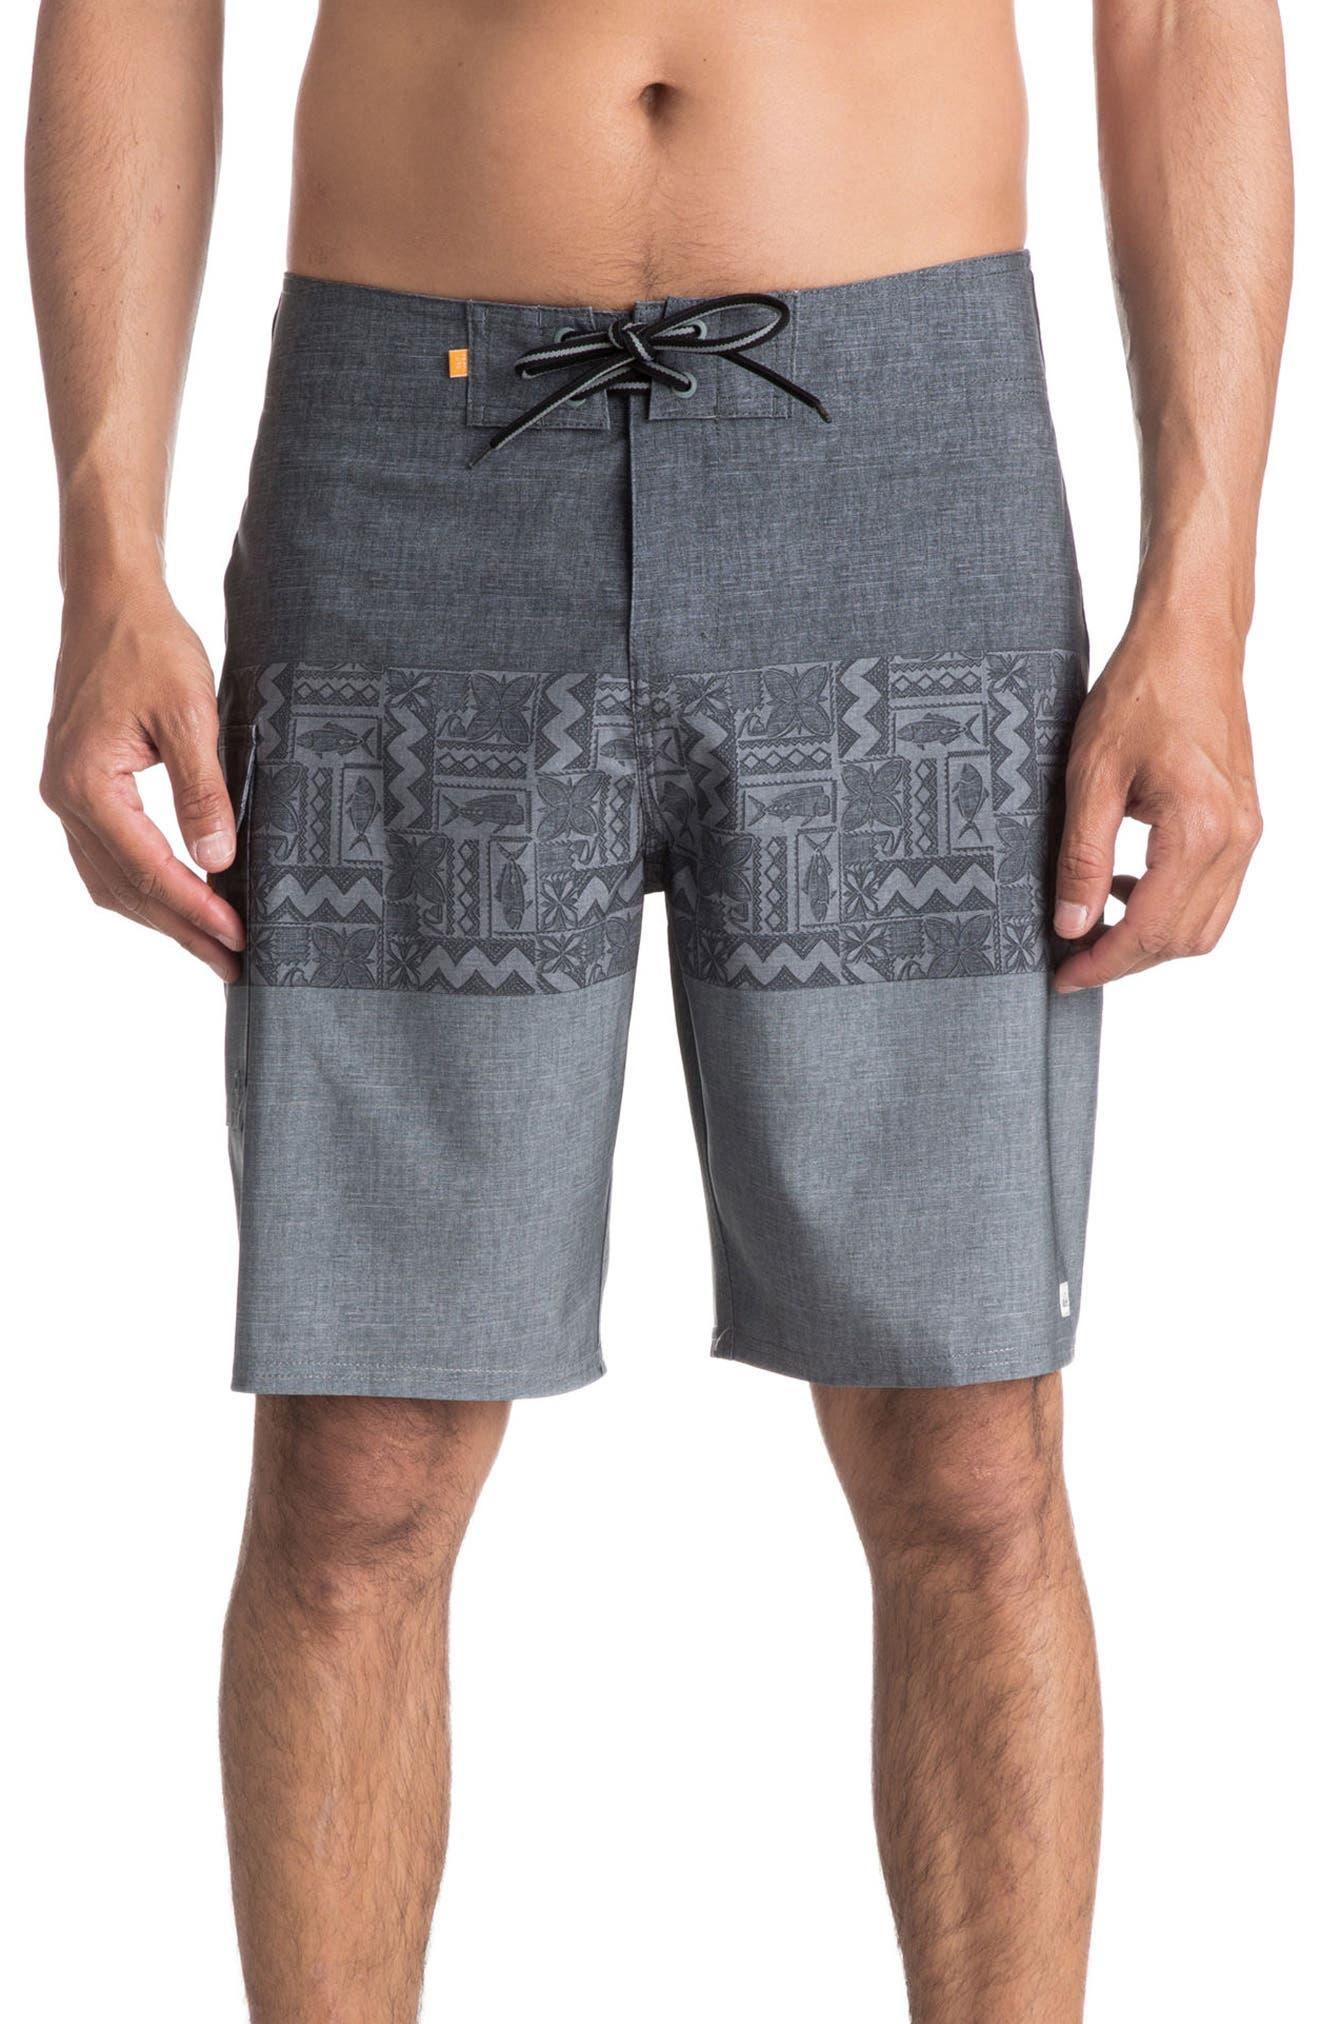 Quiksilver Fairway Triblock Board Shorts